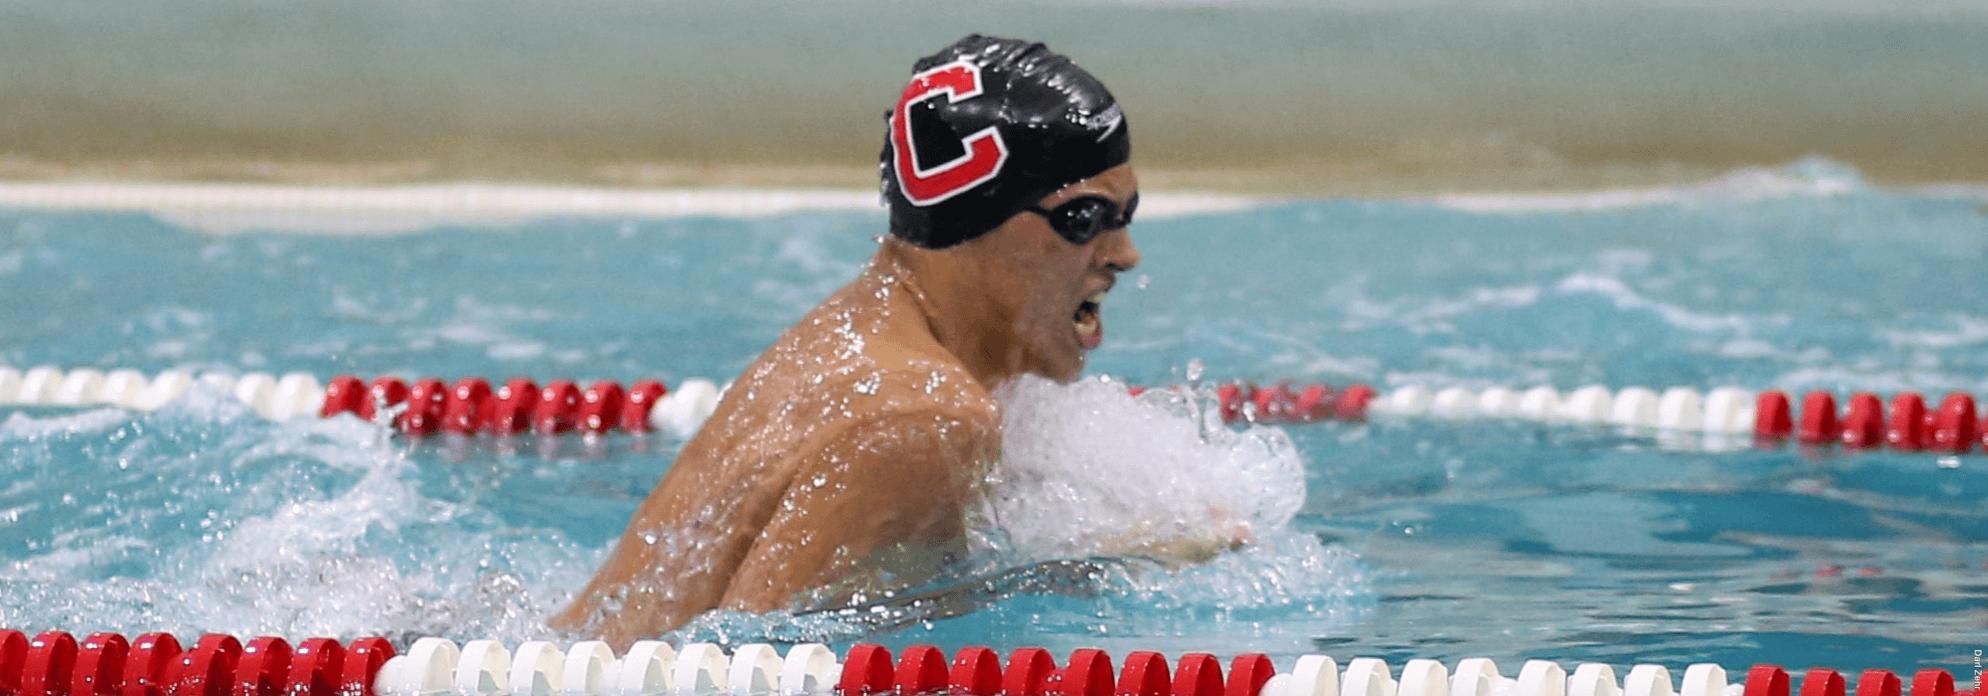 Evdokimov Posts 53.79 100 Breast as 3 Cornell Pool Records Fall